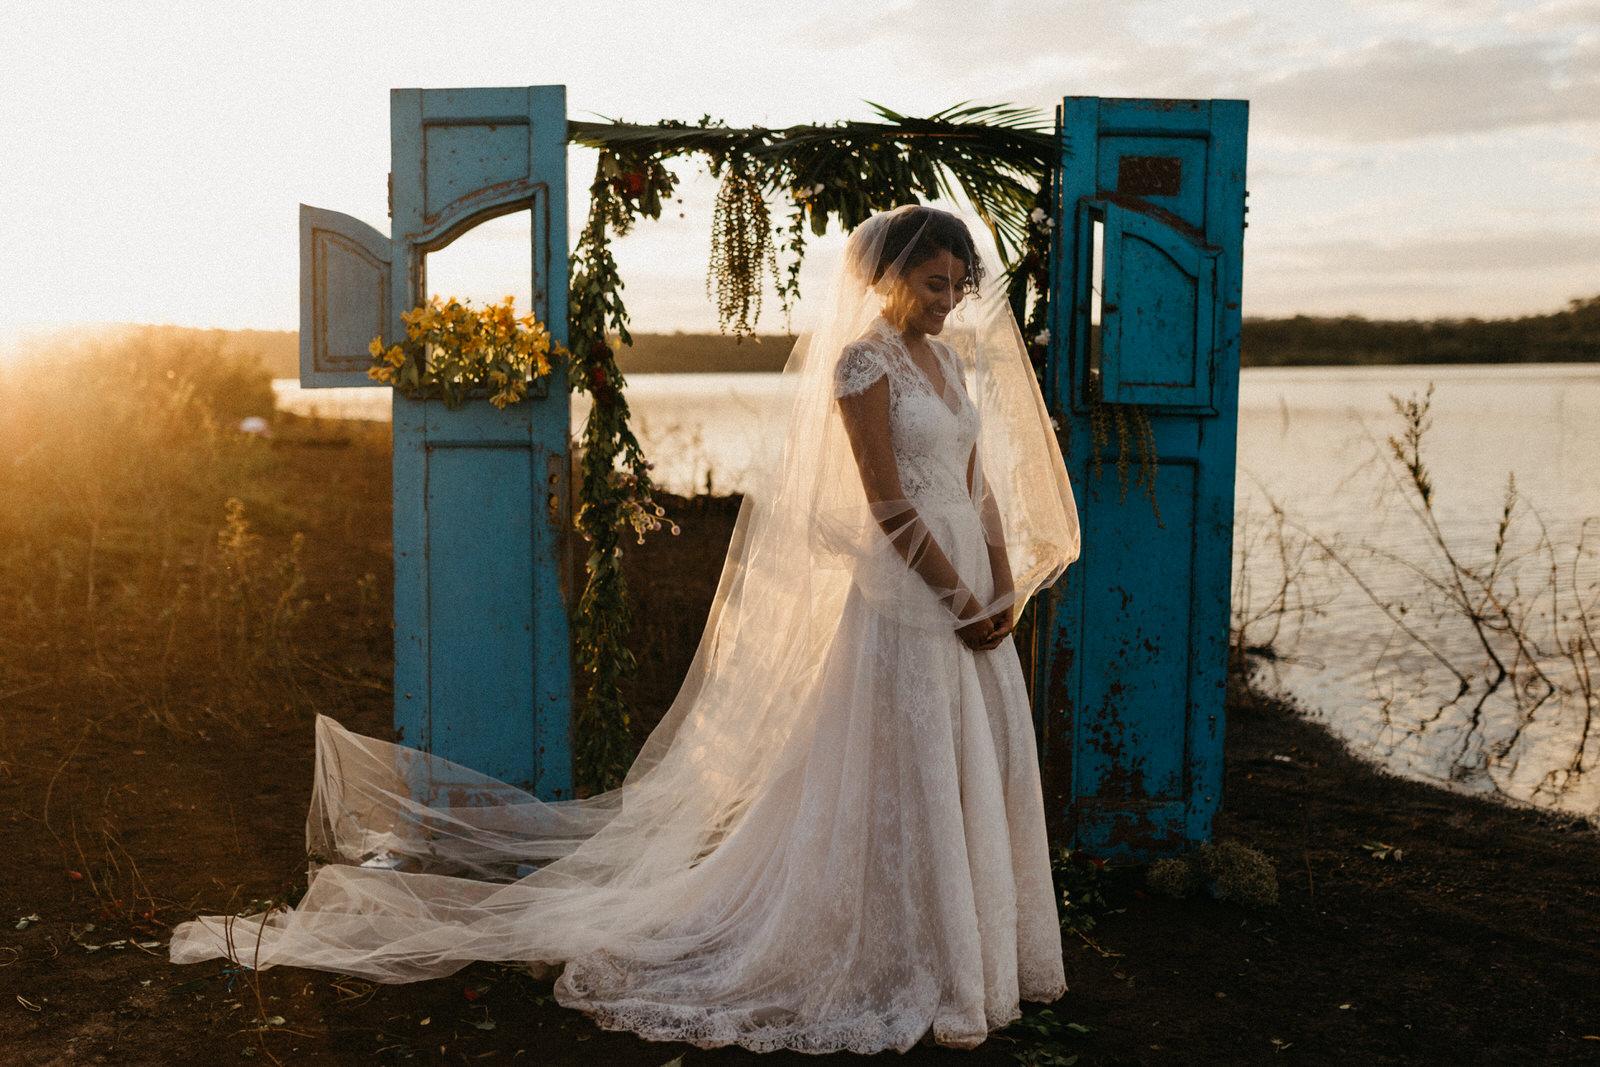 Céu_fotografia_casamentos_goiás_brasil_folk_noivas_brides_alternativo (53).jpg